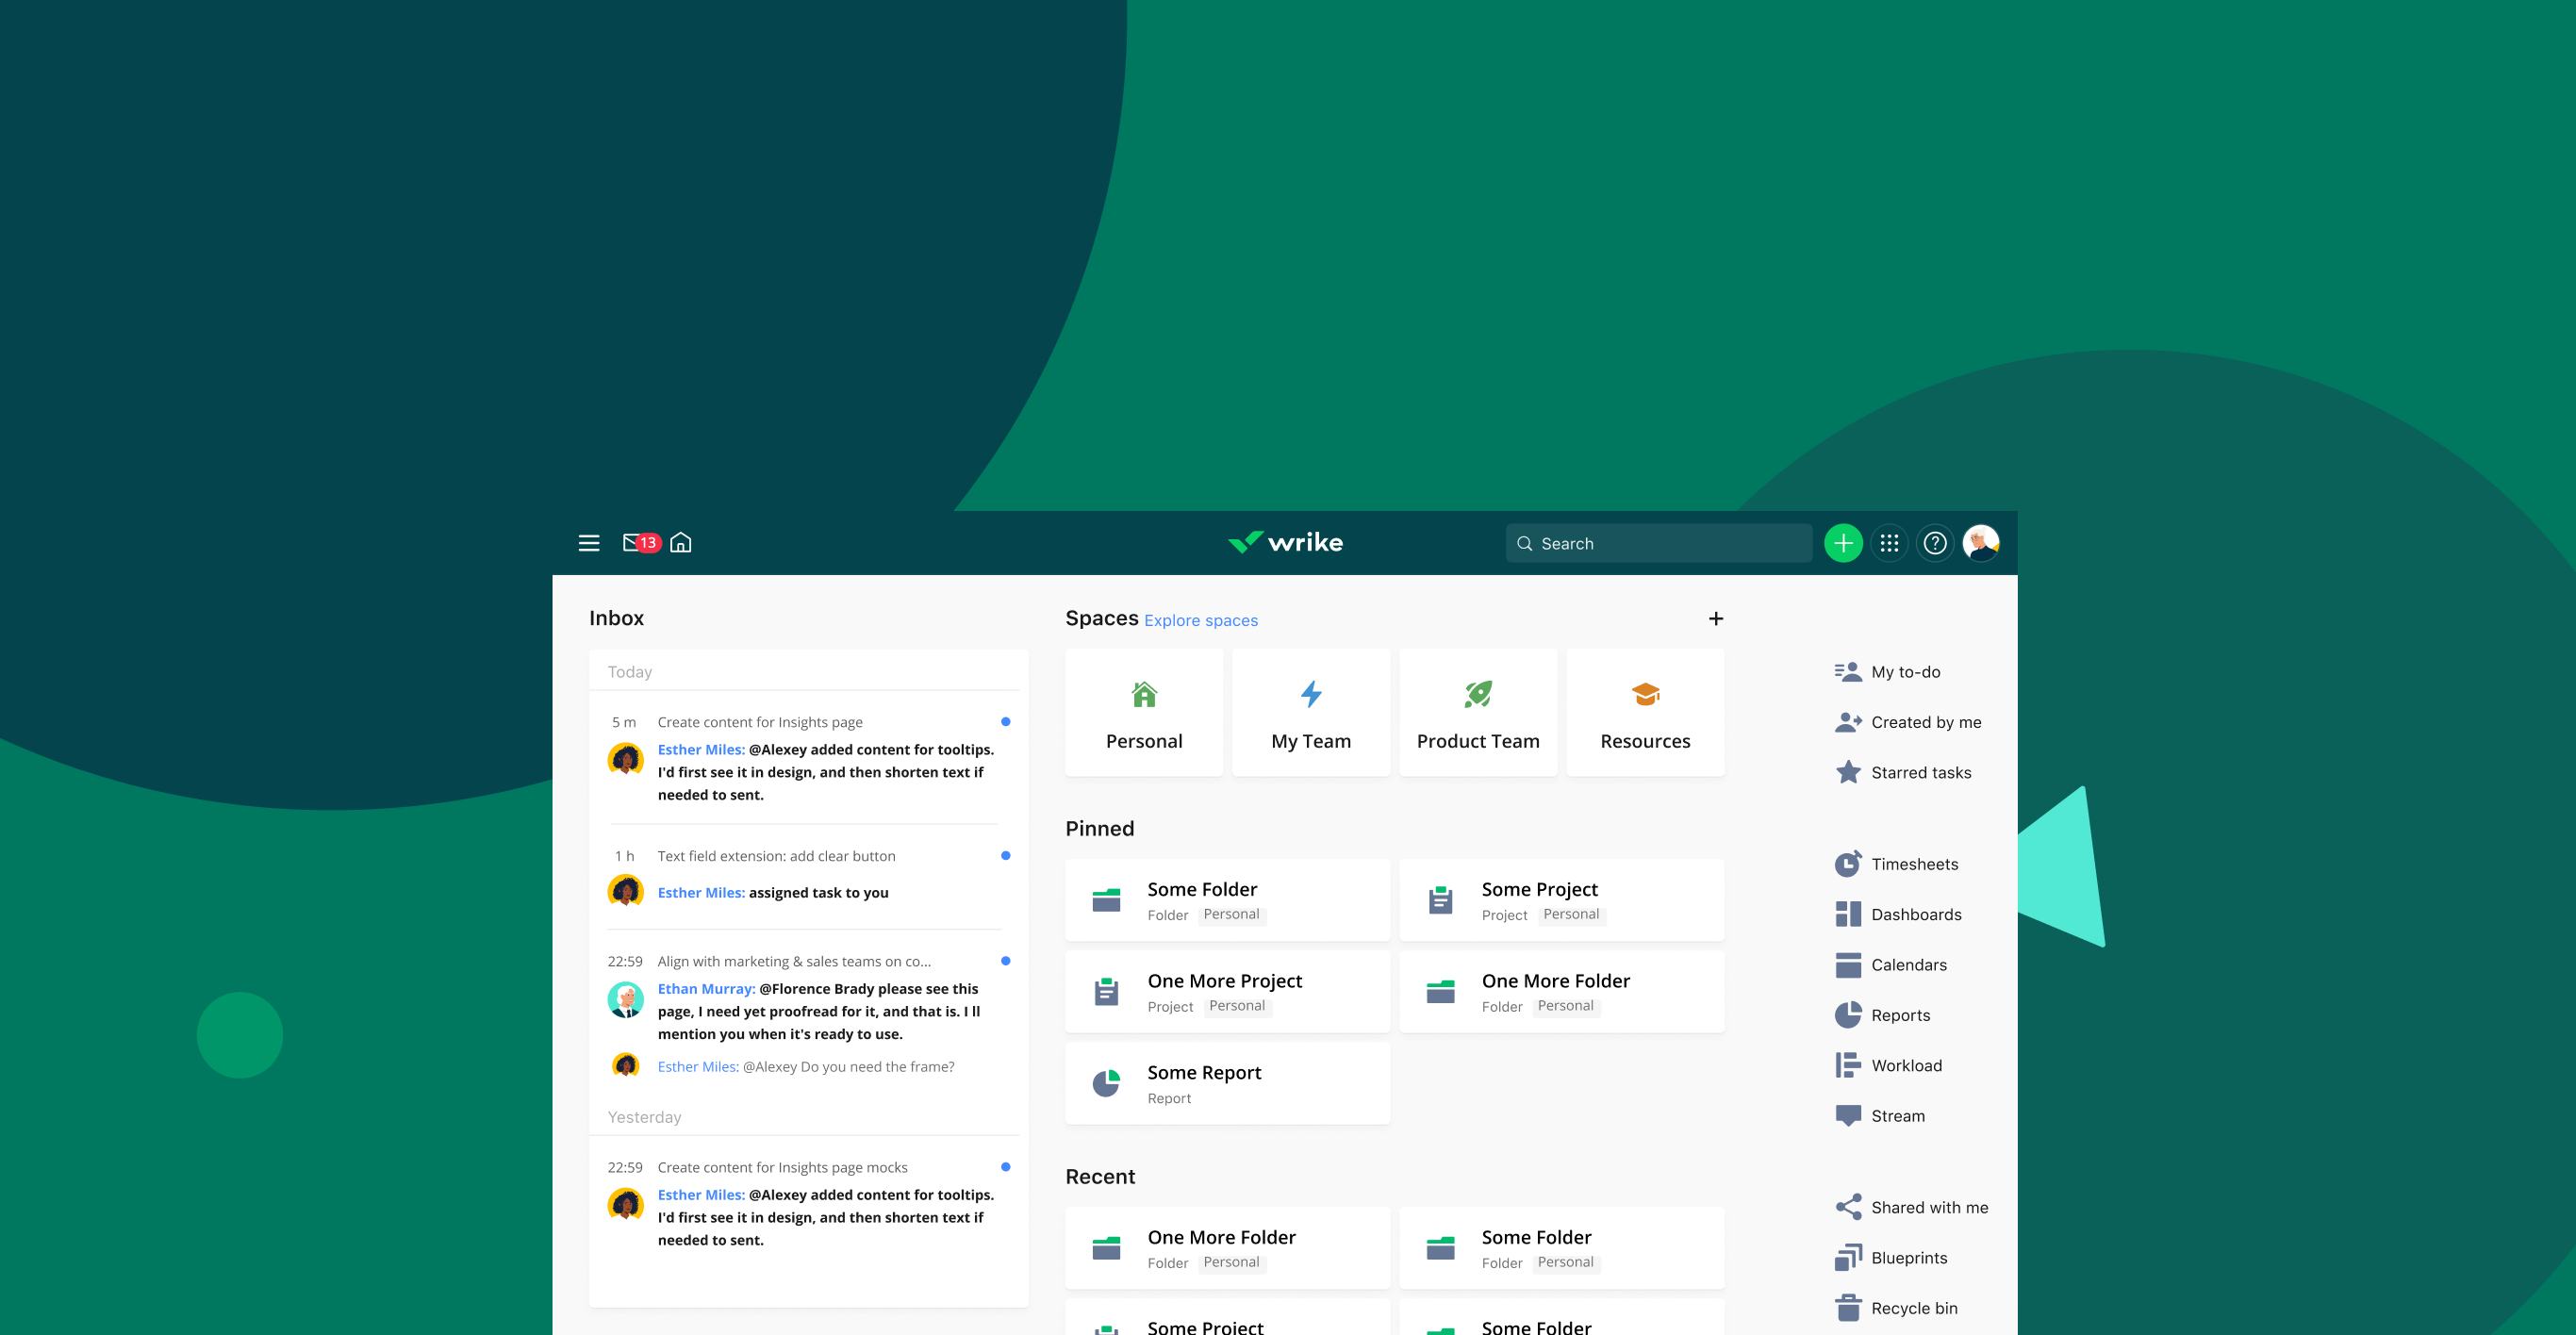 Bewertungen Wrike: Produktivitätssteigernde Projektmanagement-Software - appvizer